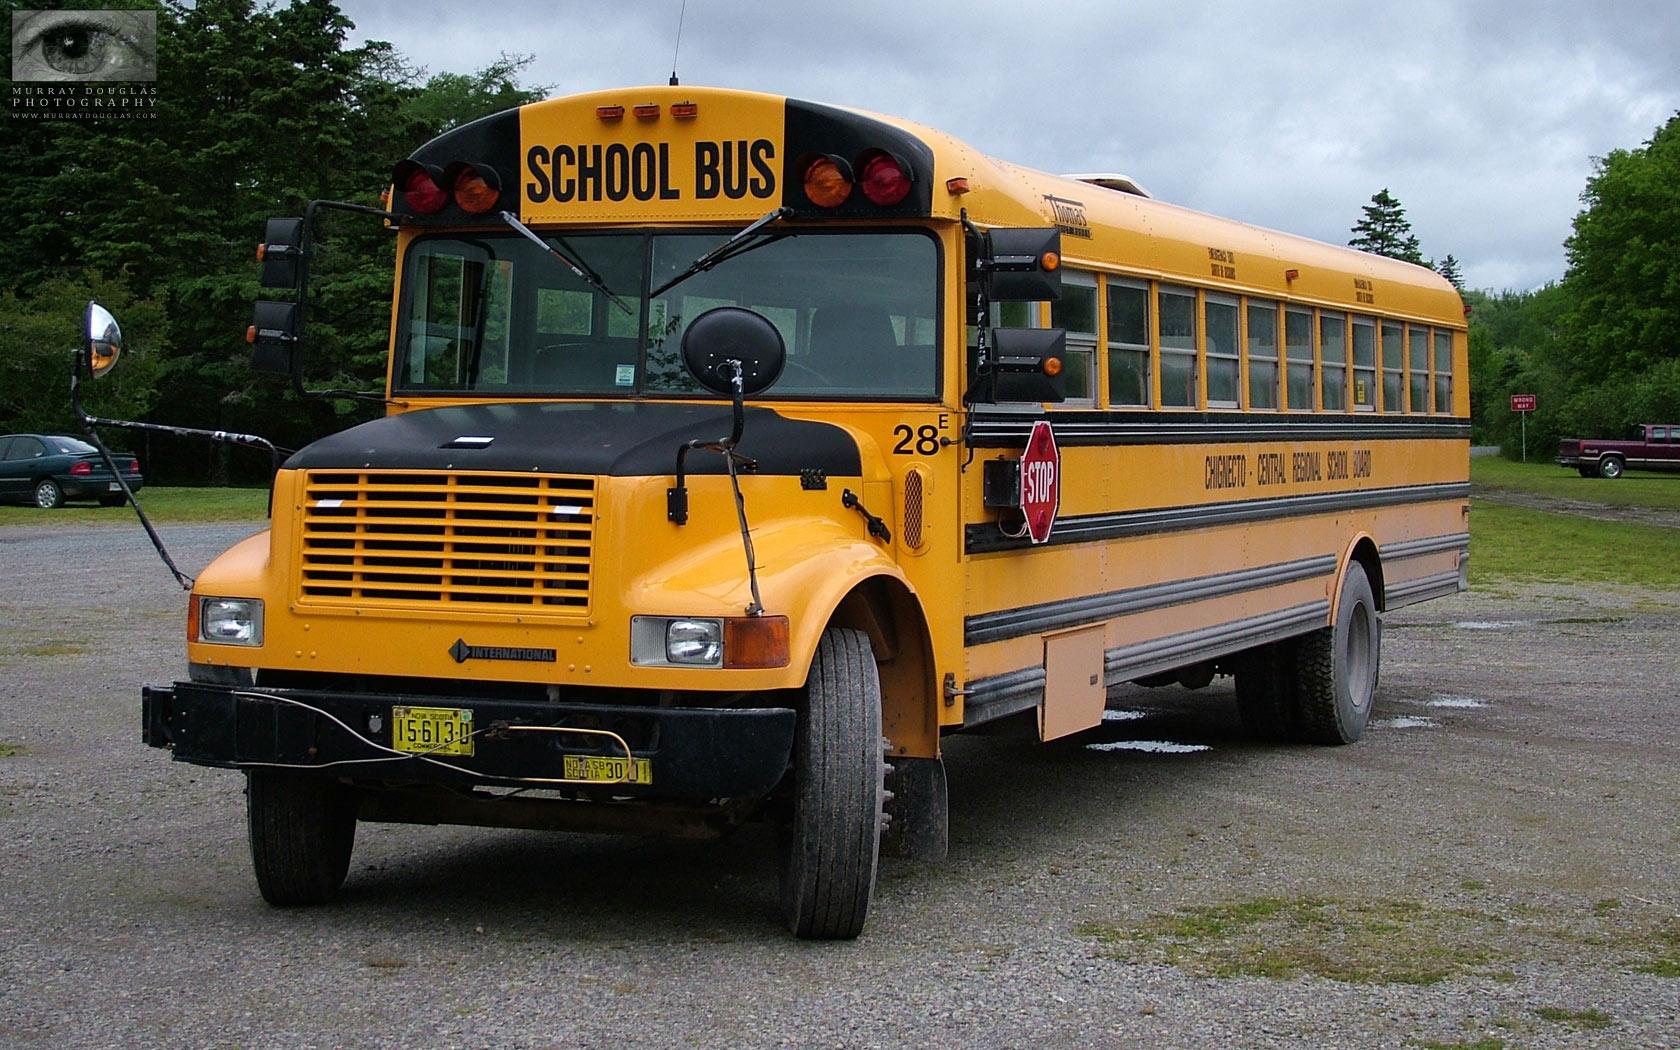 School Bus Wallpaper Back to school 1680x1050